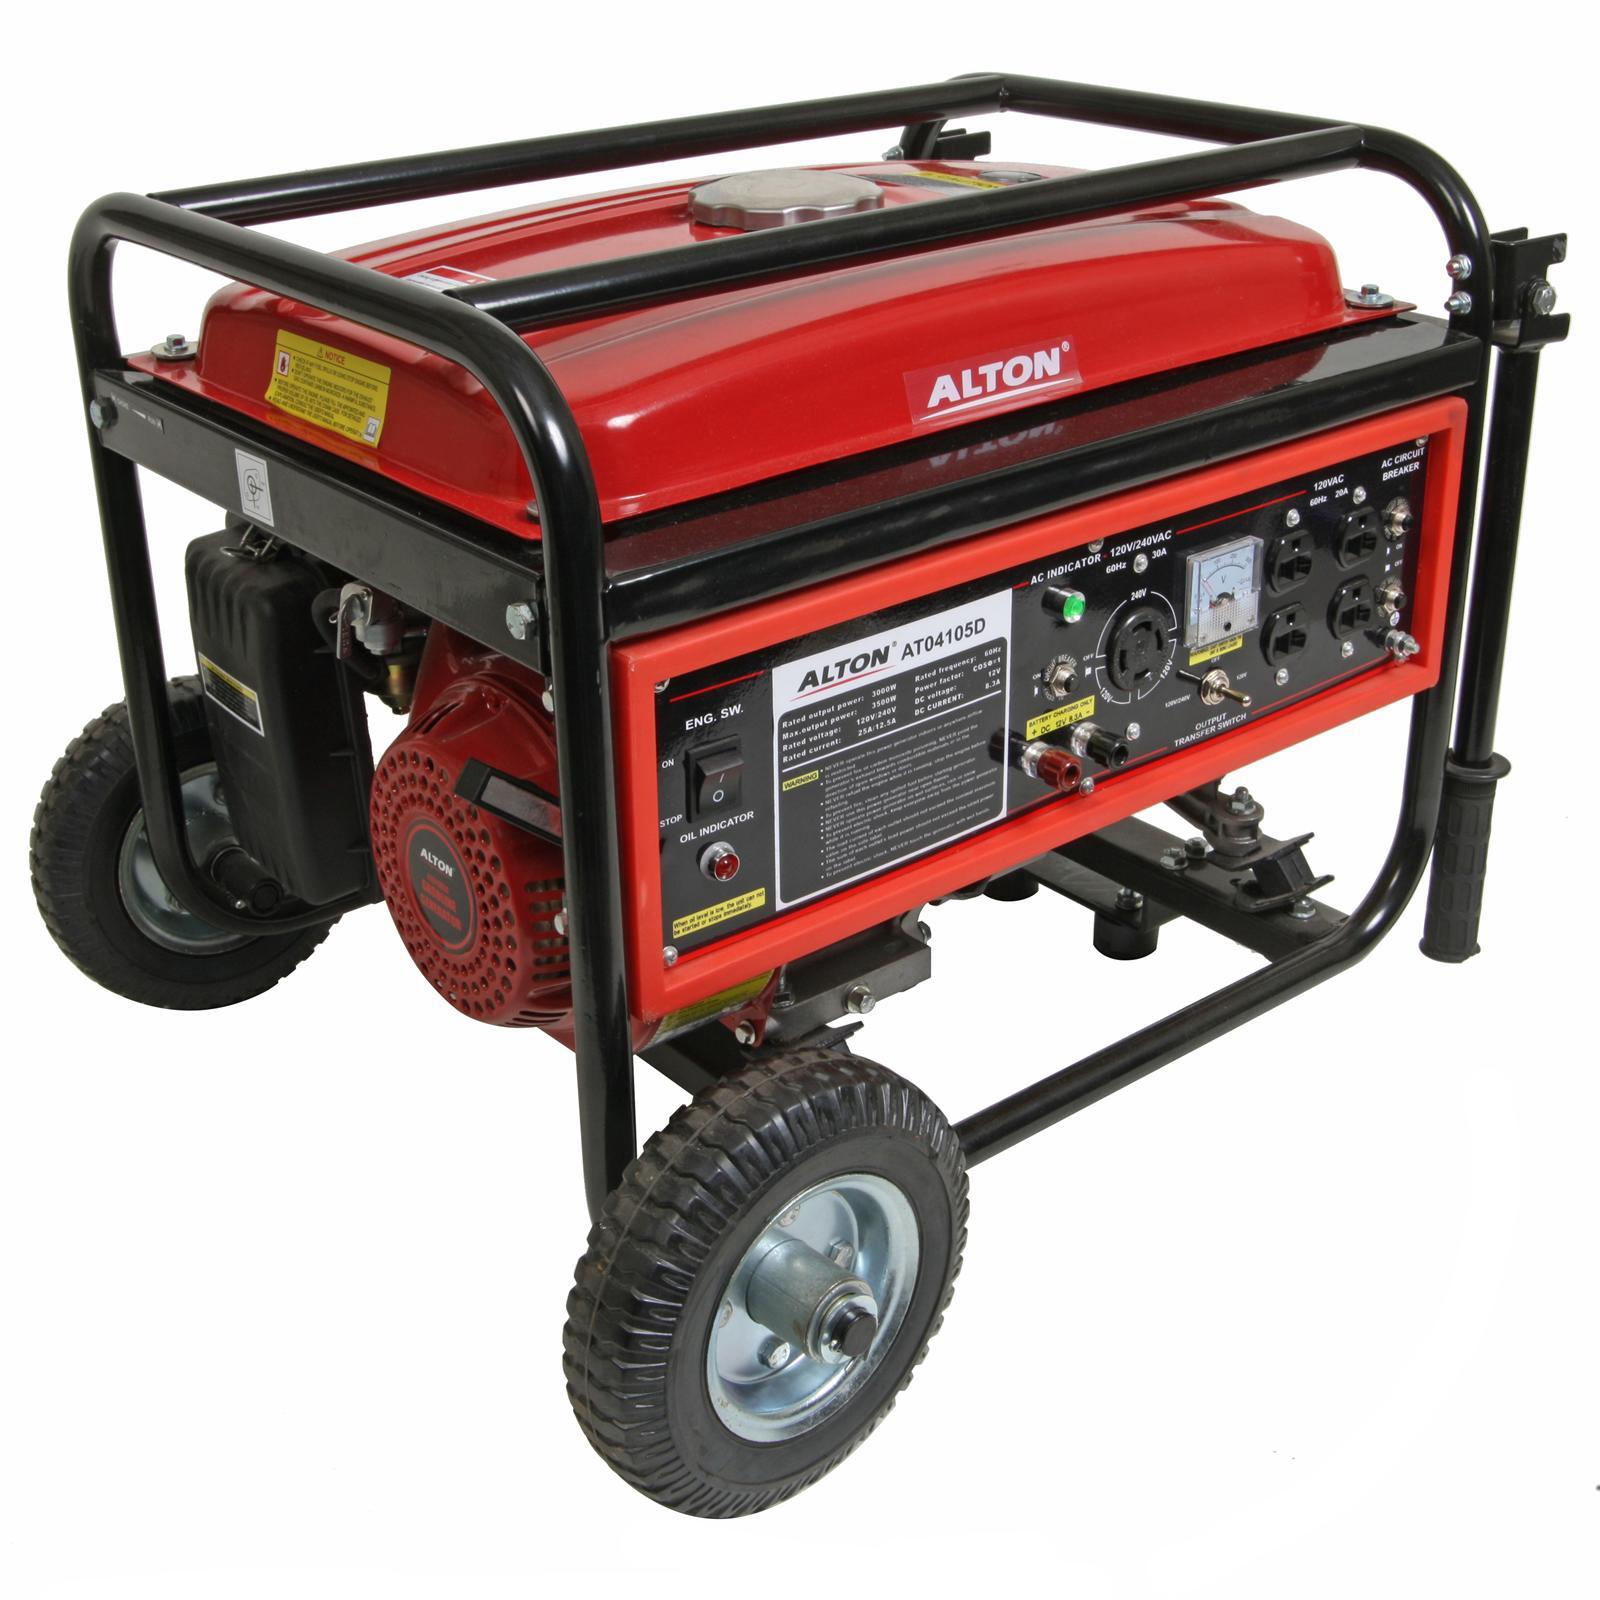 Alton generator at04147